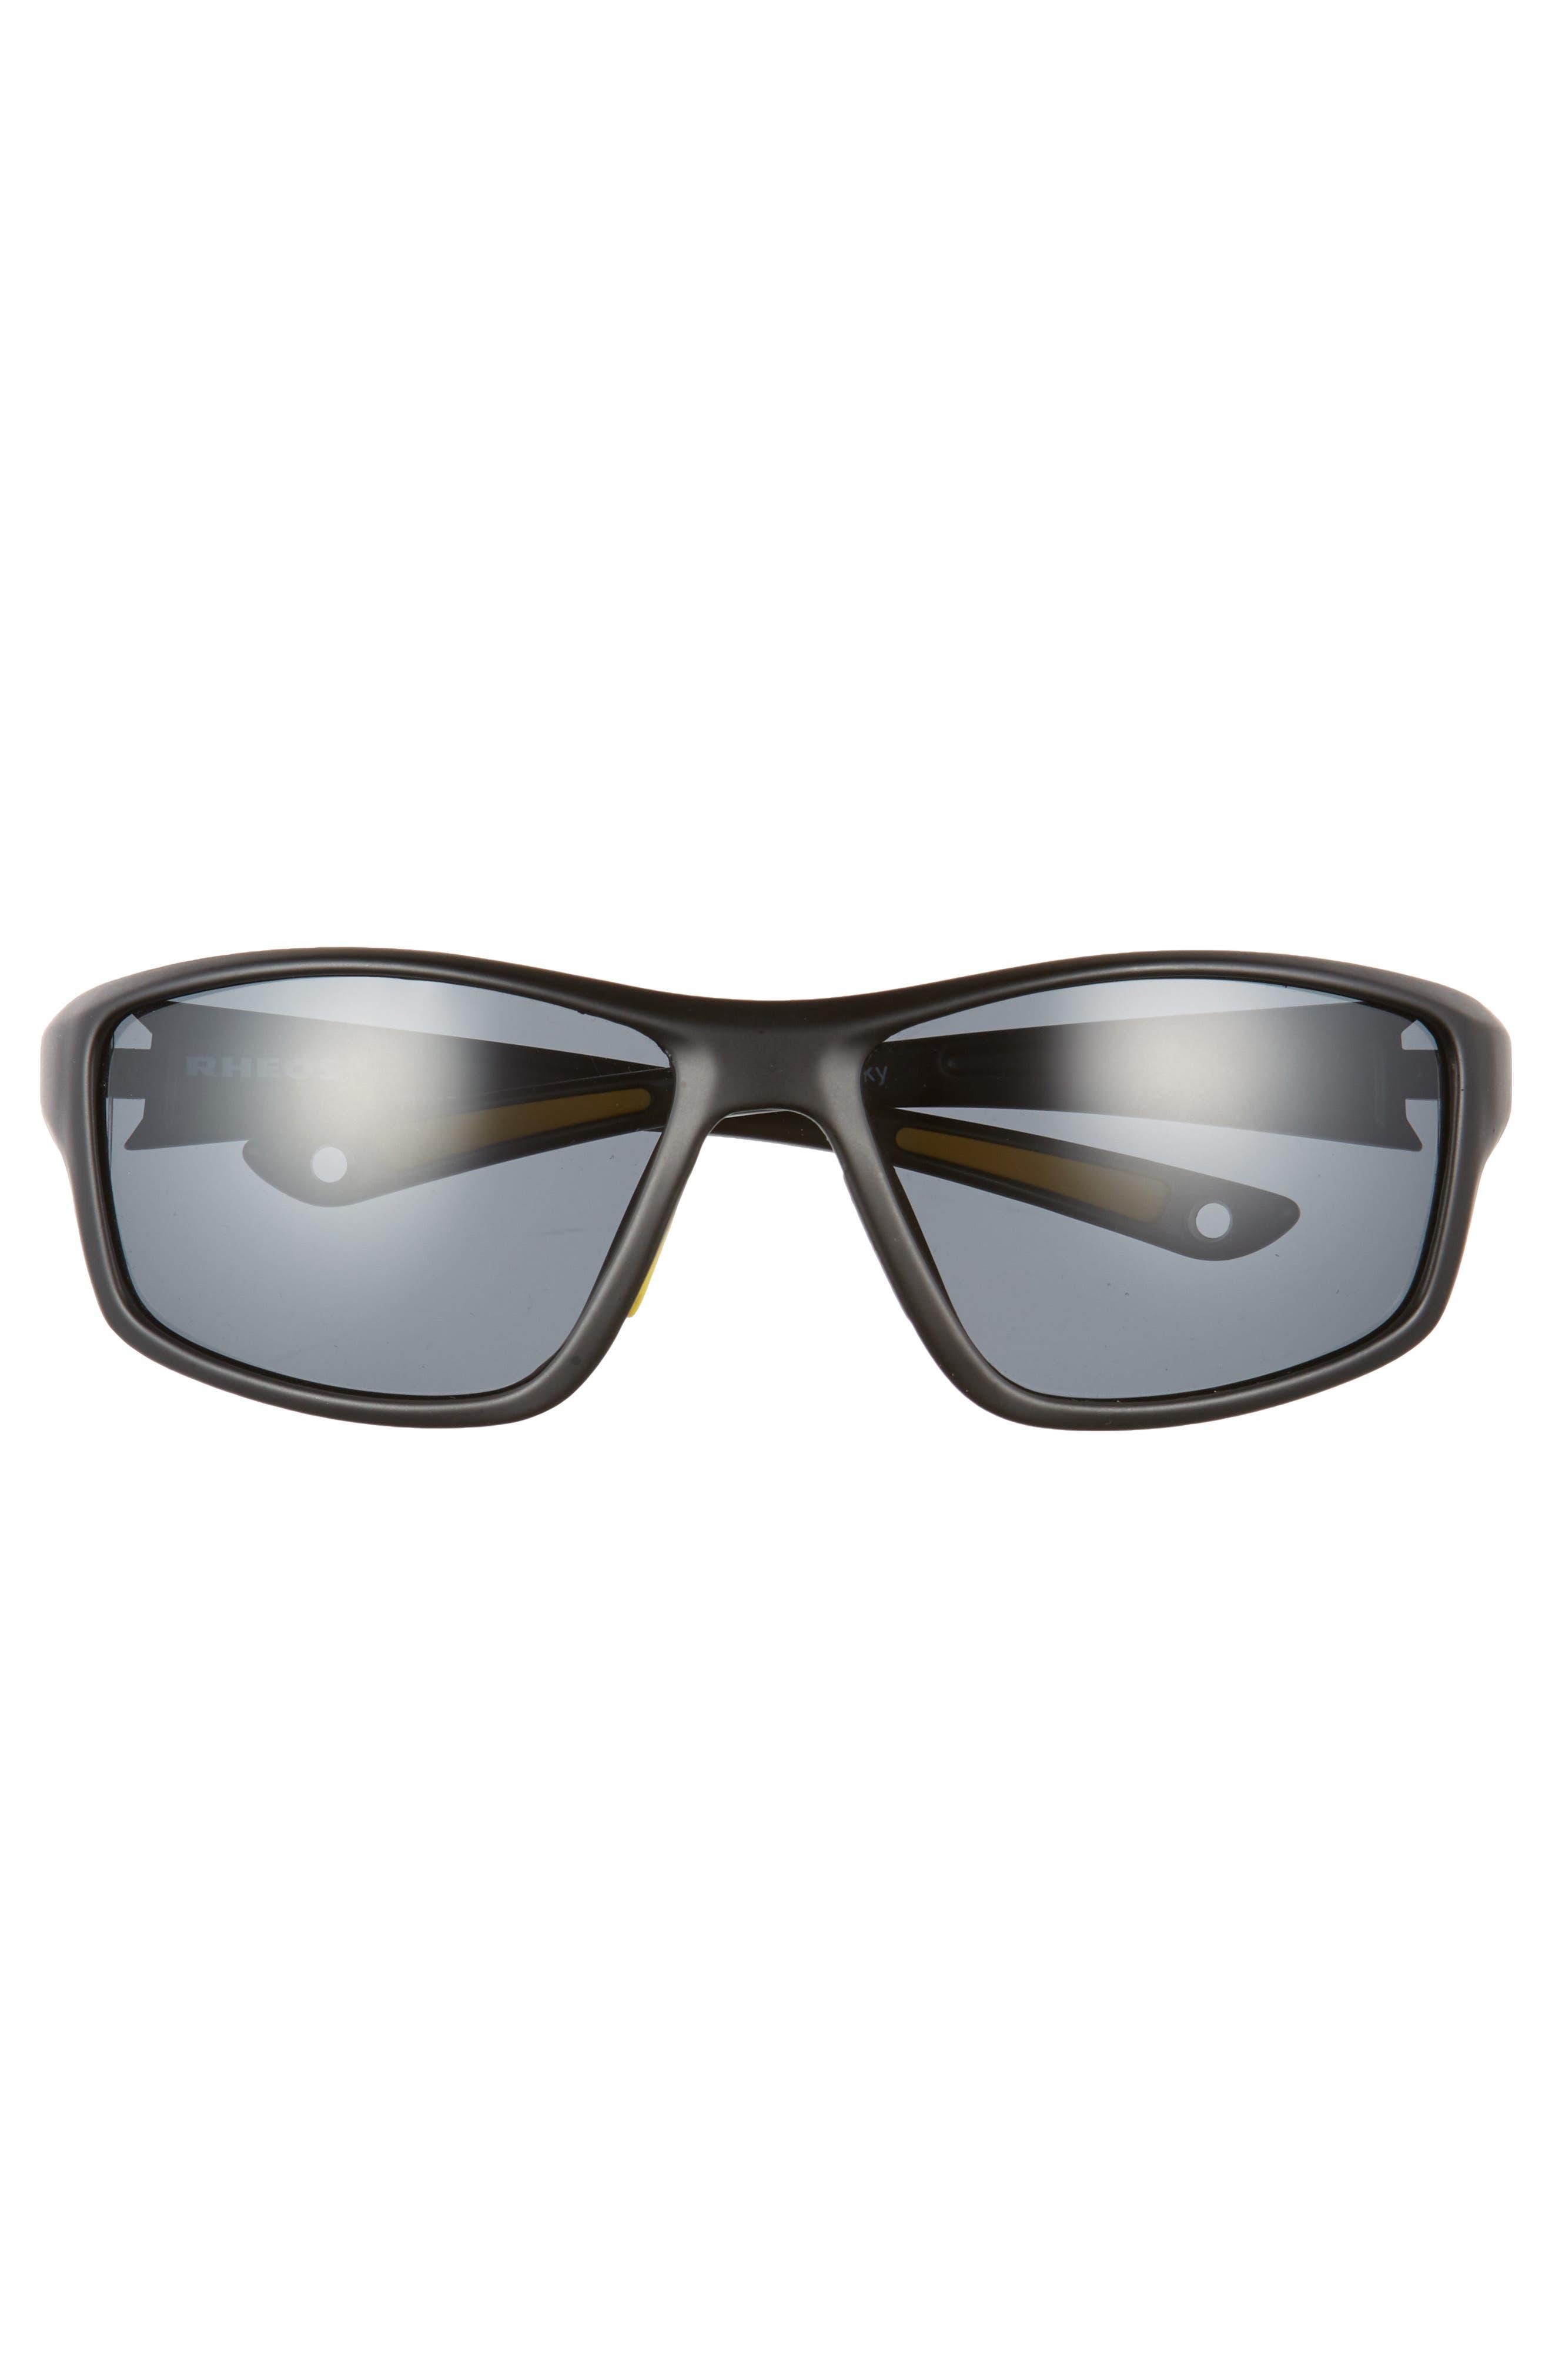 Eddies Floating 58mm Polarized Sunglasses,                             Alternate thumbnail 2, color,                             029